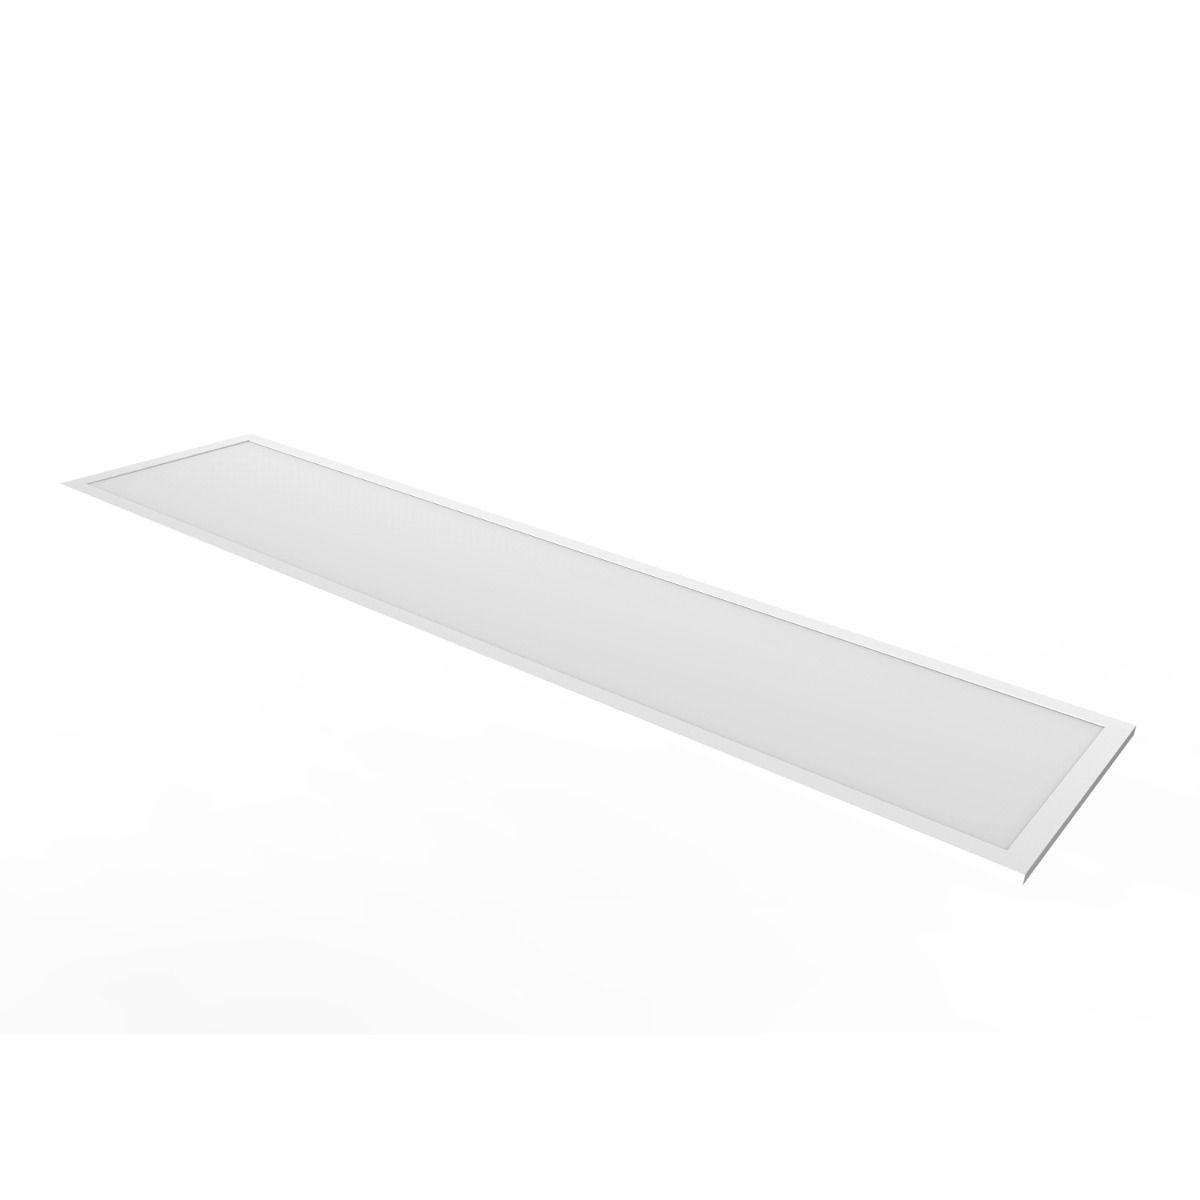 Noxion Panel LED Ecowhite V2.0 30x120cm 3000K 36W UGR <22 | Luz Cálida - Reemplazo 2x36W